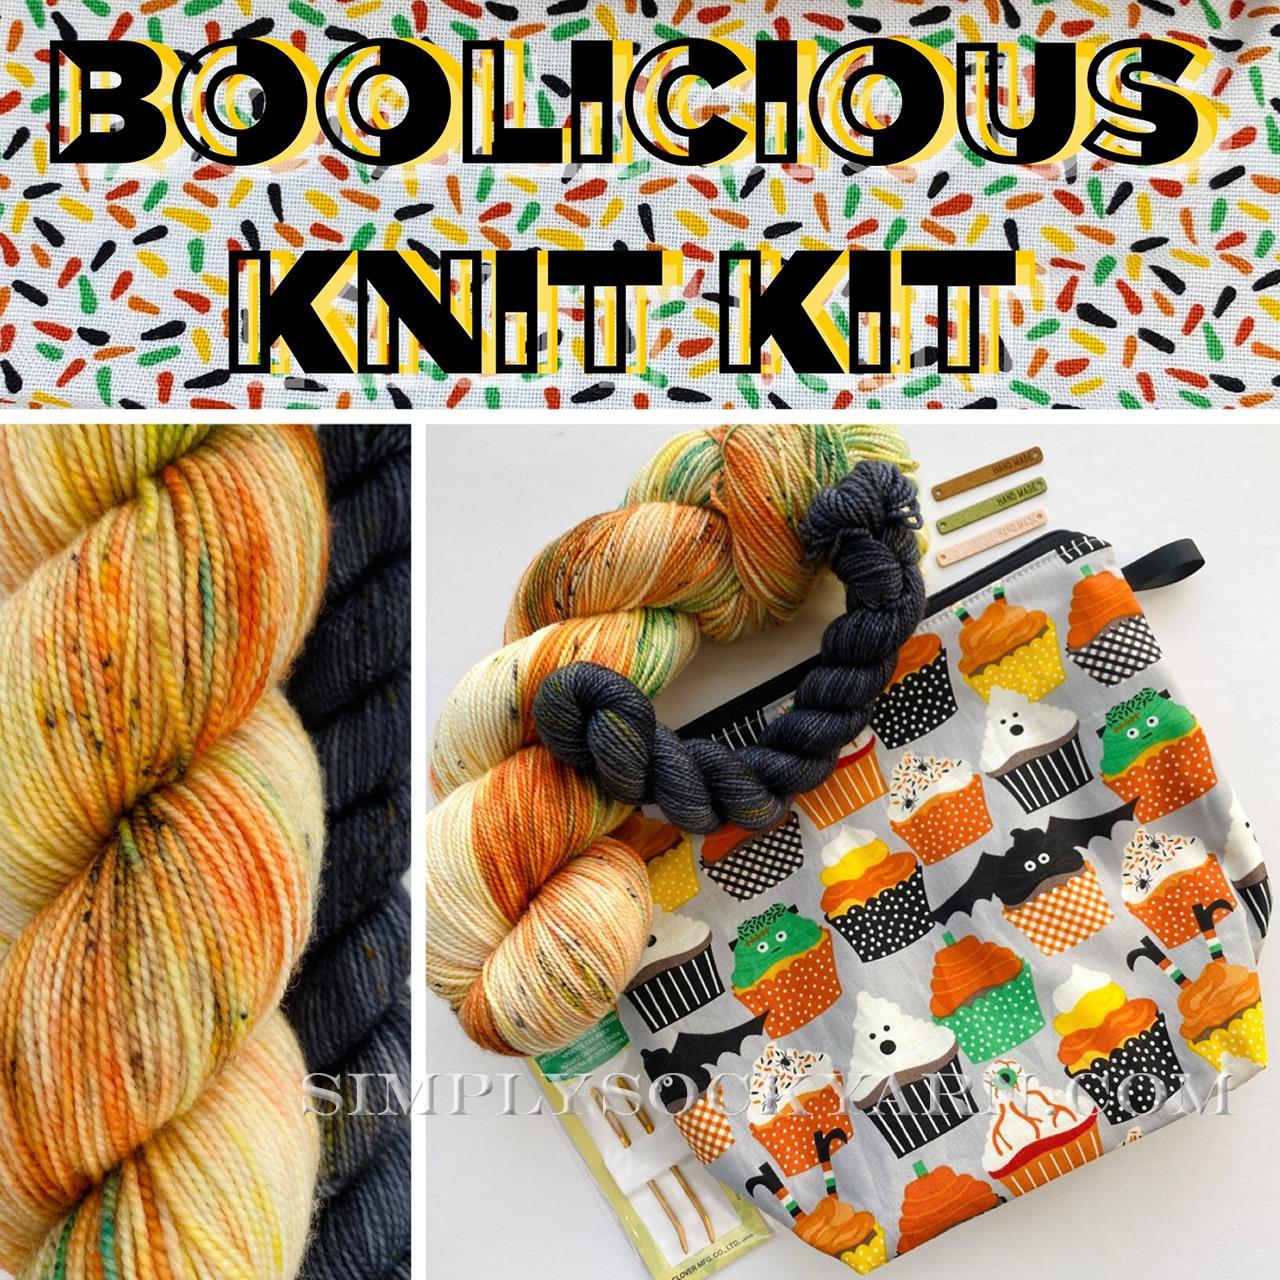 SSYC Boolicious Knit Kit -